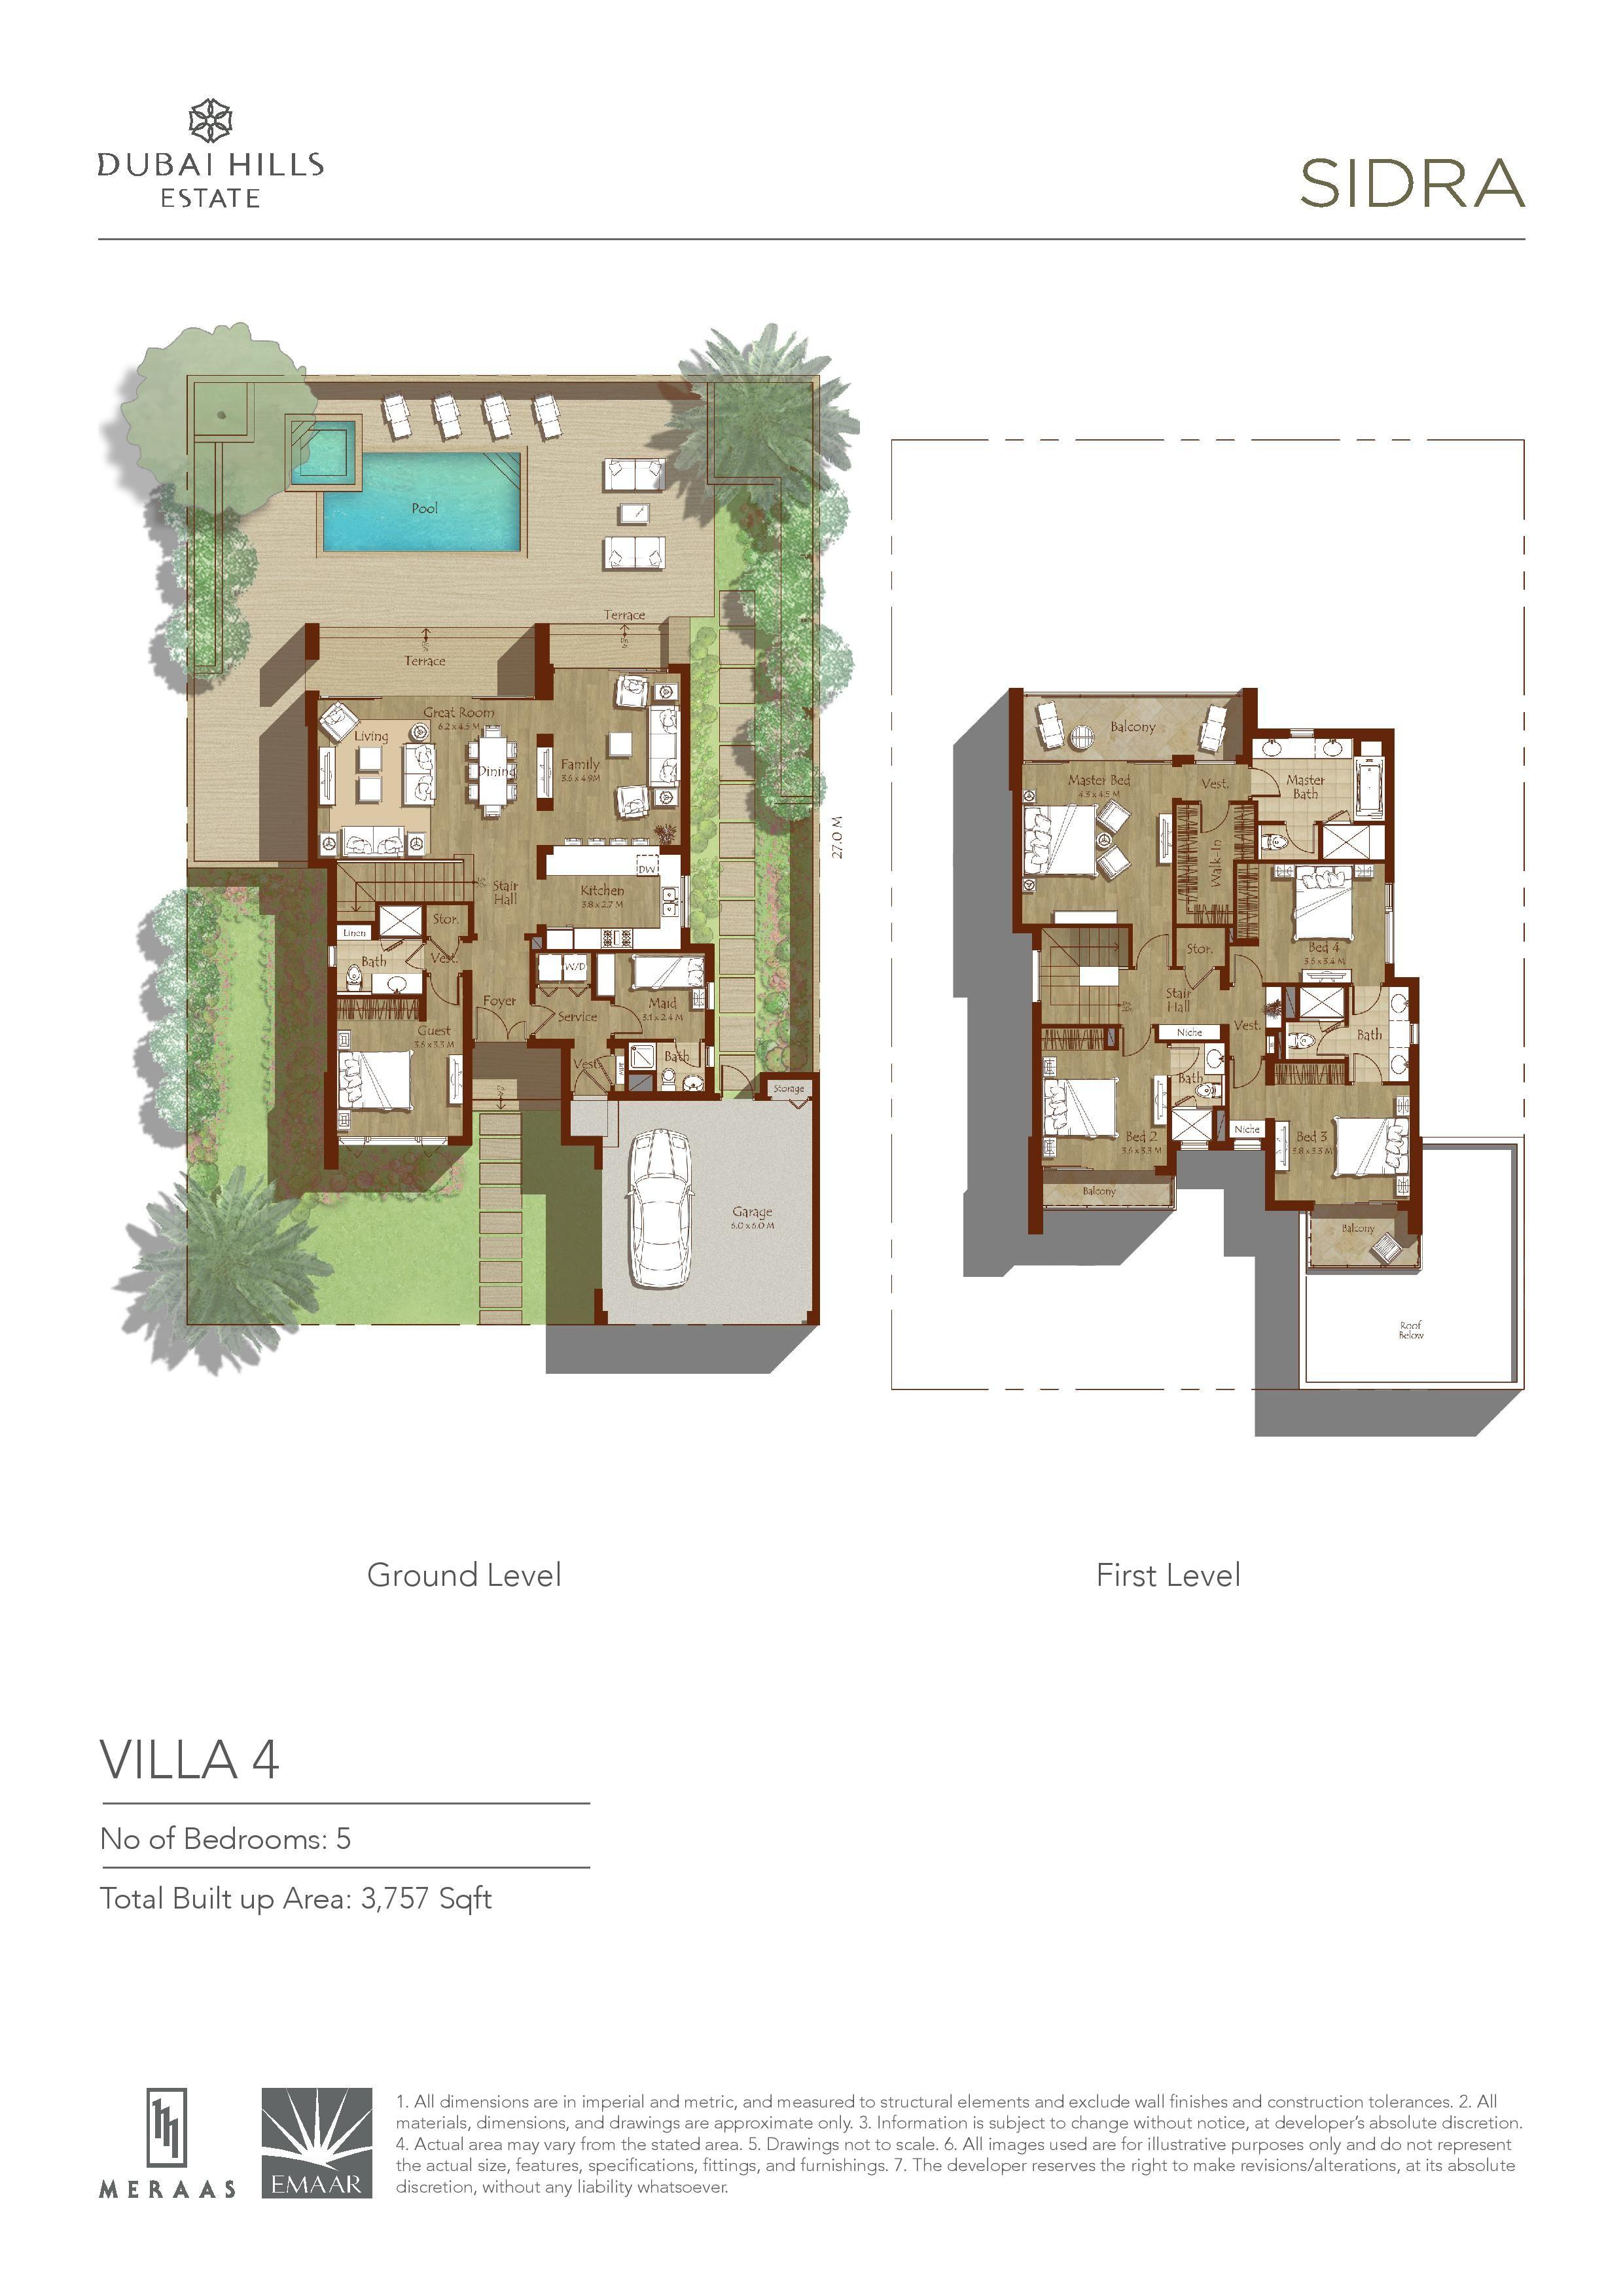 sidra villa floor plans - dubai hills estates | dubai hills